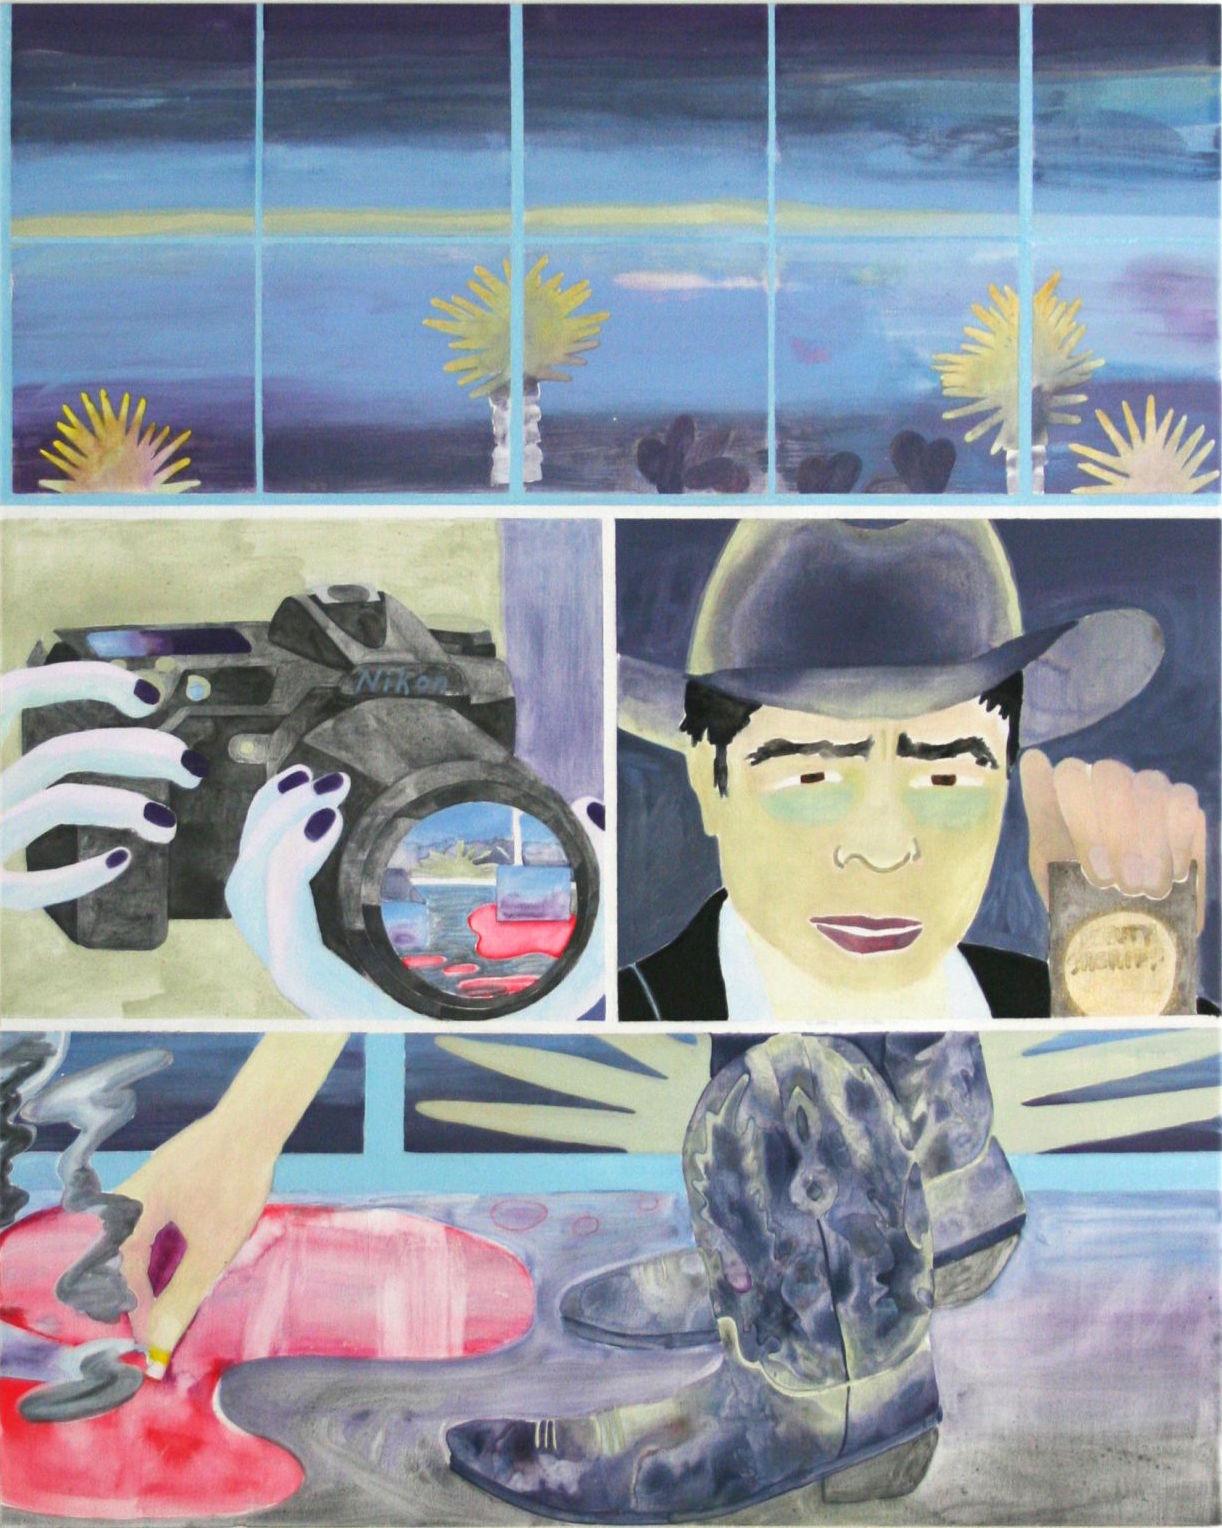 Tess Bilhartz, Deputy, 2015, acrylic and oil on panel, 24 x 30 inches (courtesy